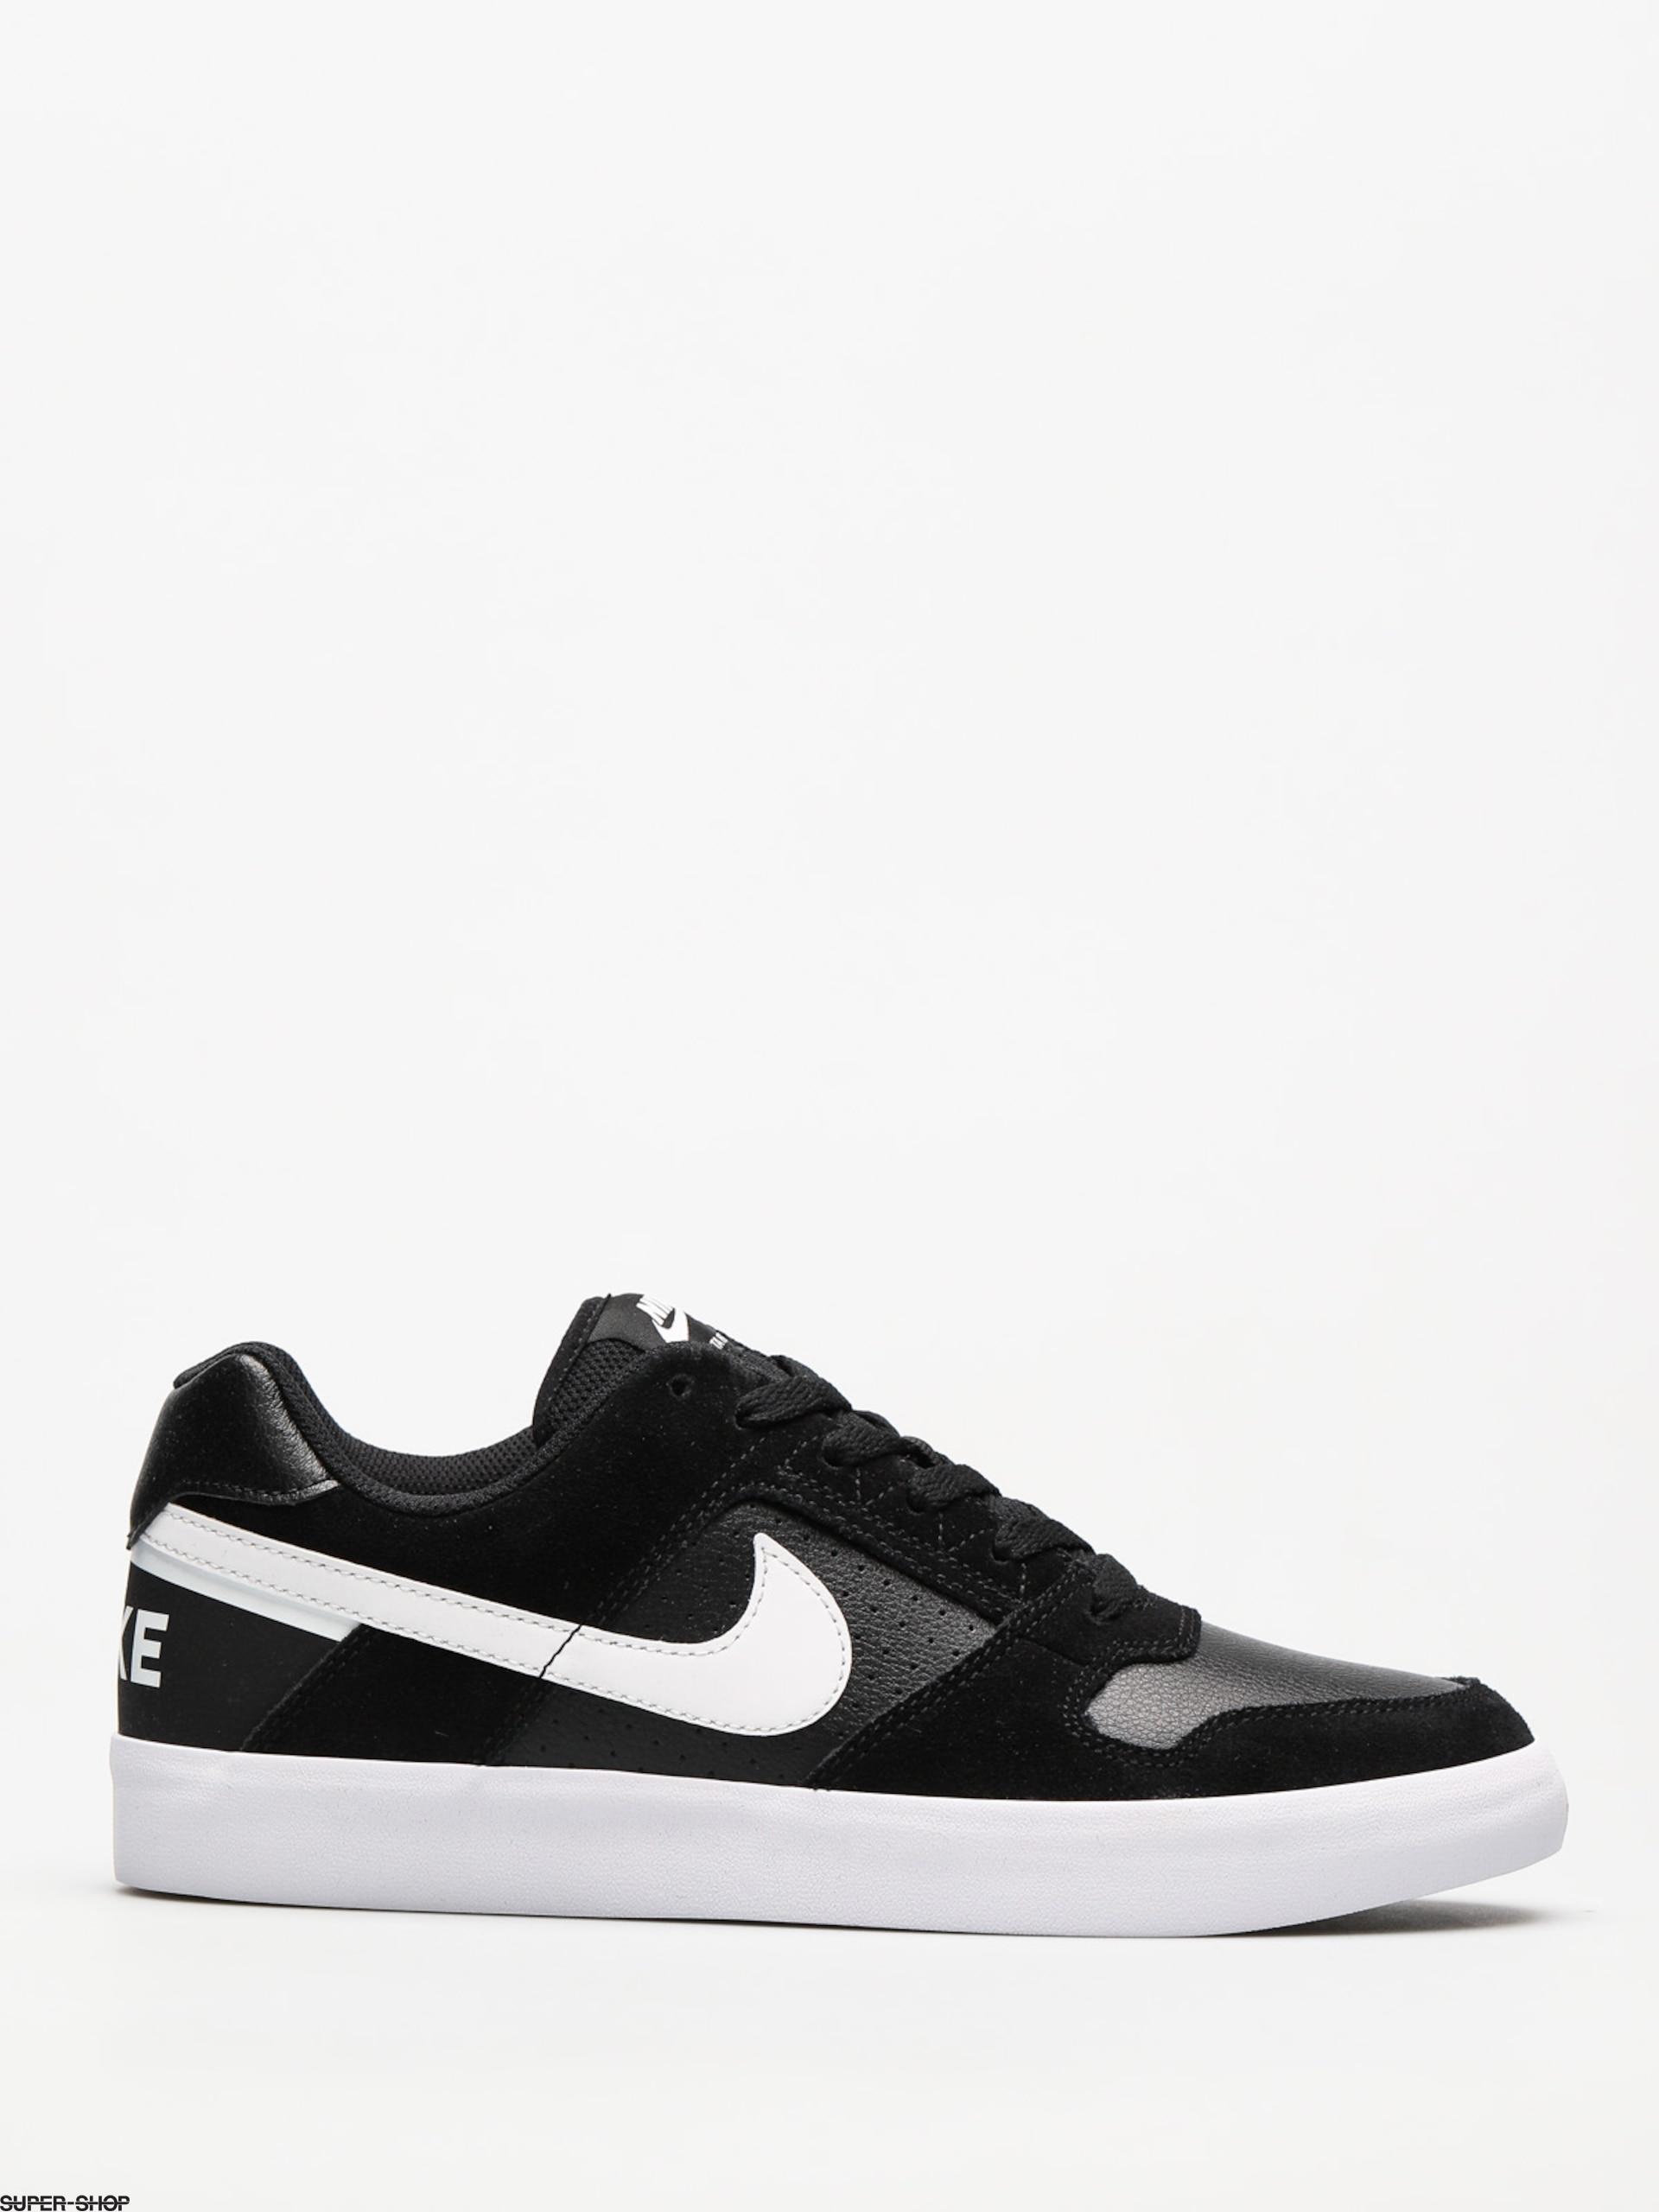 08a7d9e1c0b8c Nike SB Shoes Sb Delta Force Vulc (black/white anthracite white)